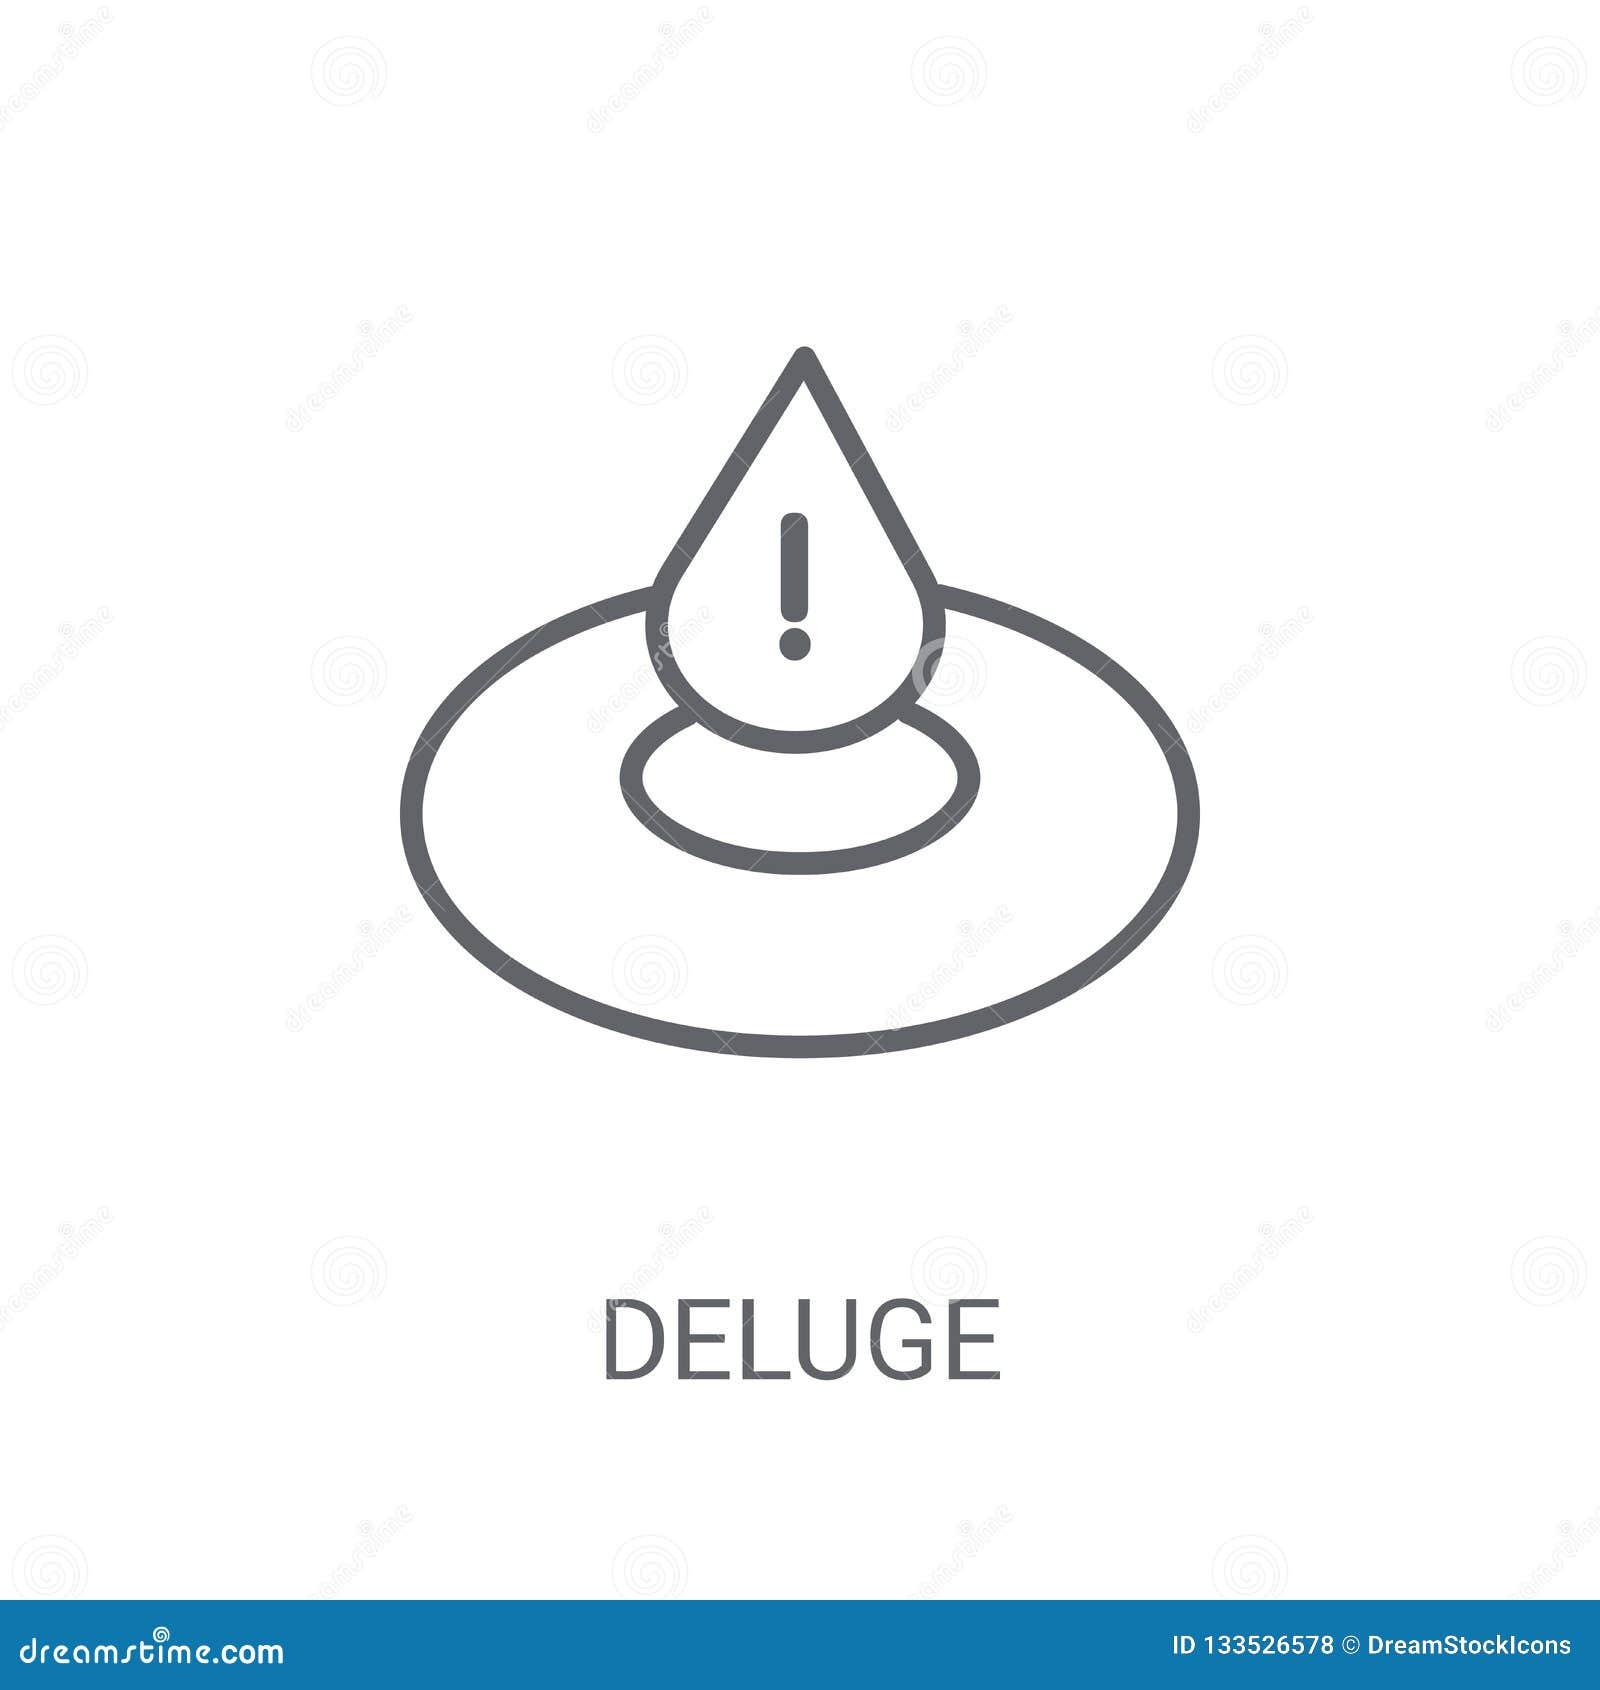 Deluge Icon  Trendy Deluge Logo Concept On White Background